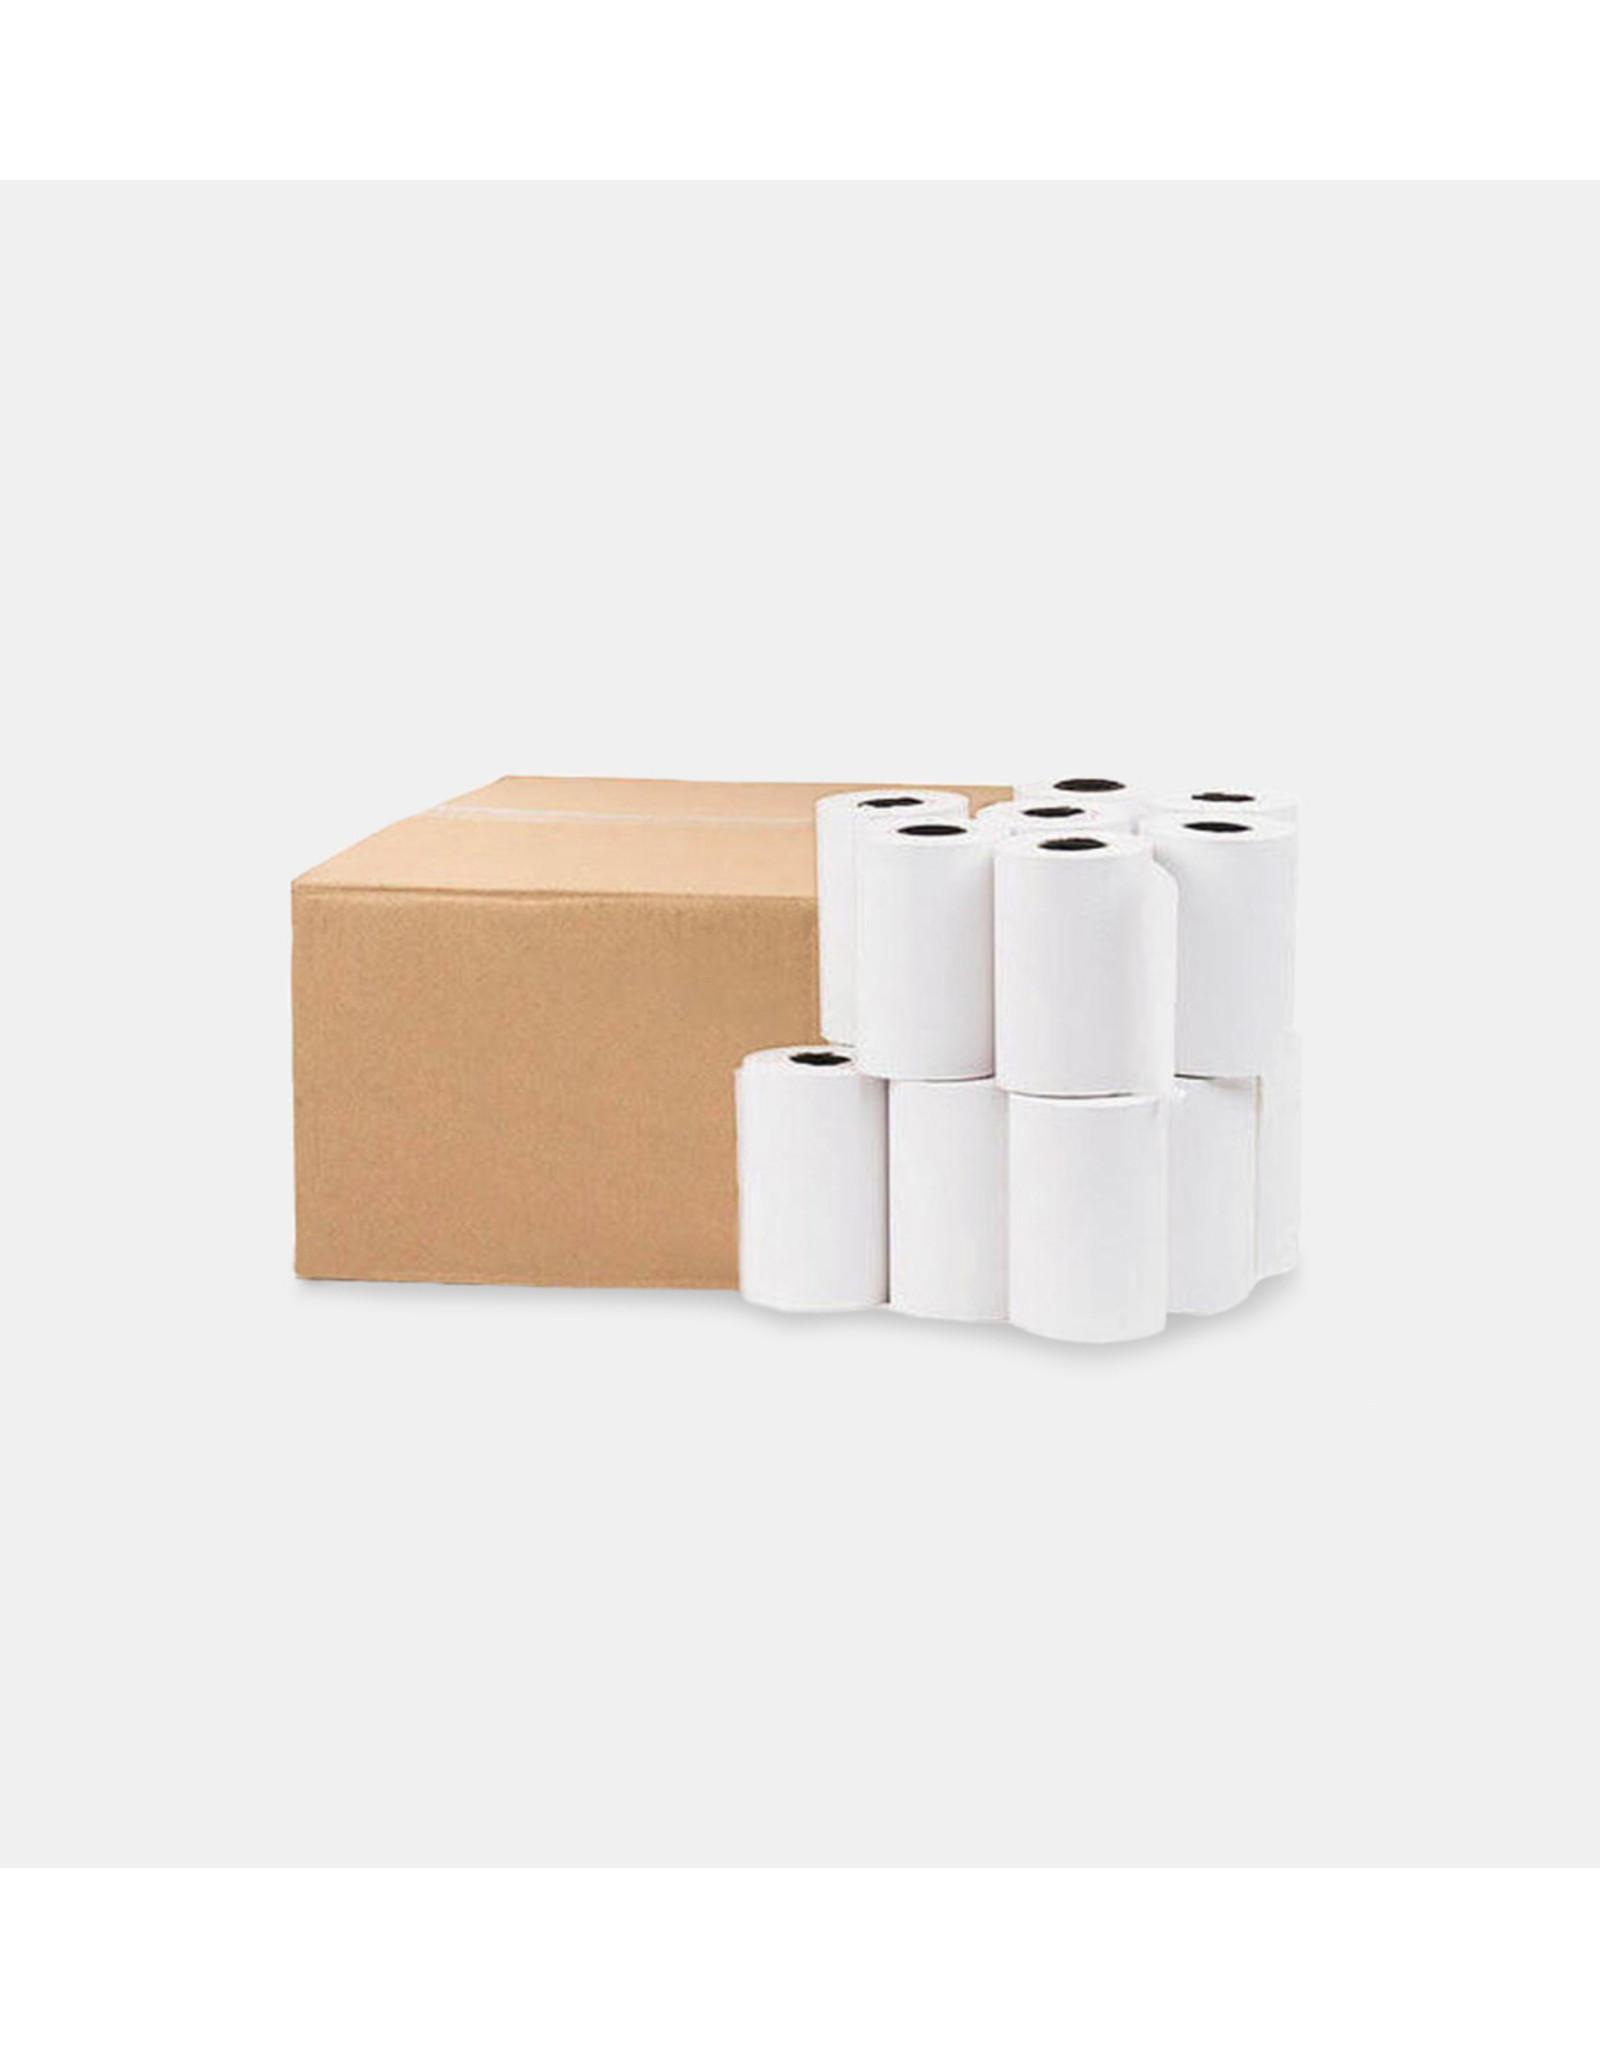 Calibor Bundle - 3 Boxes of Duplicate Copy Kitchen Printer Paper